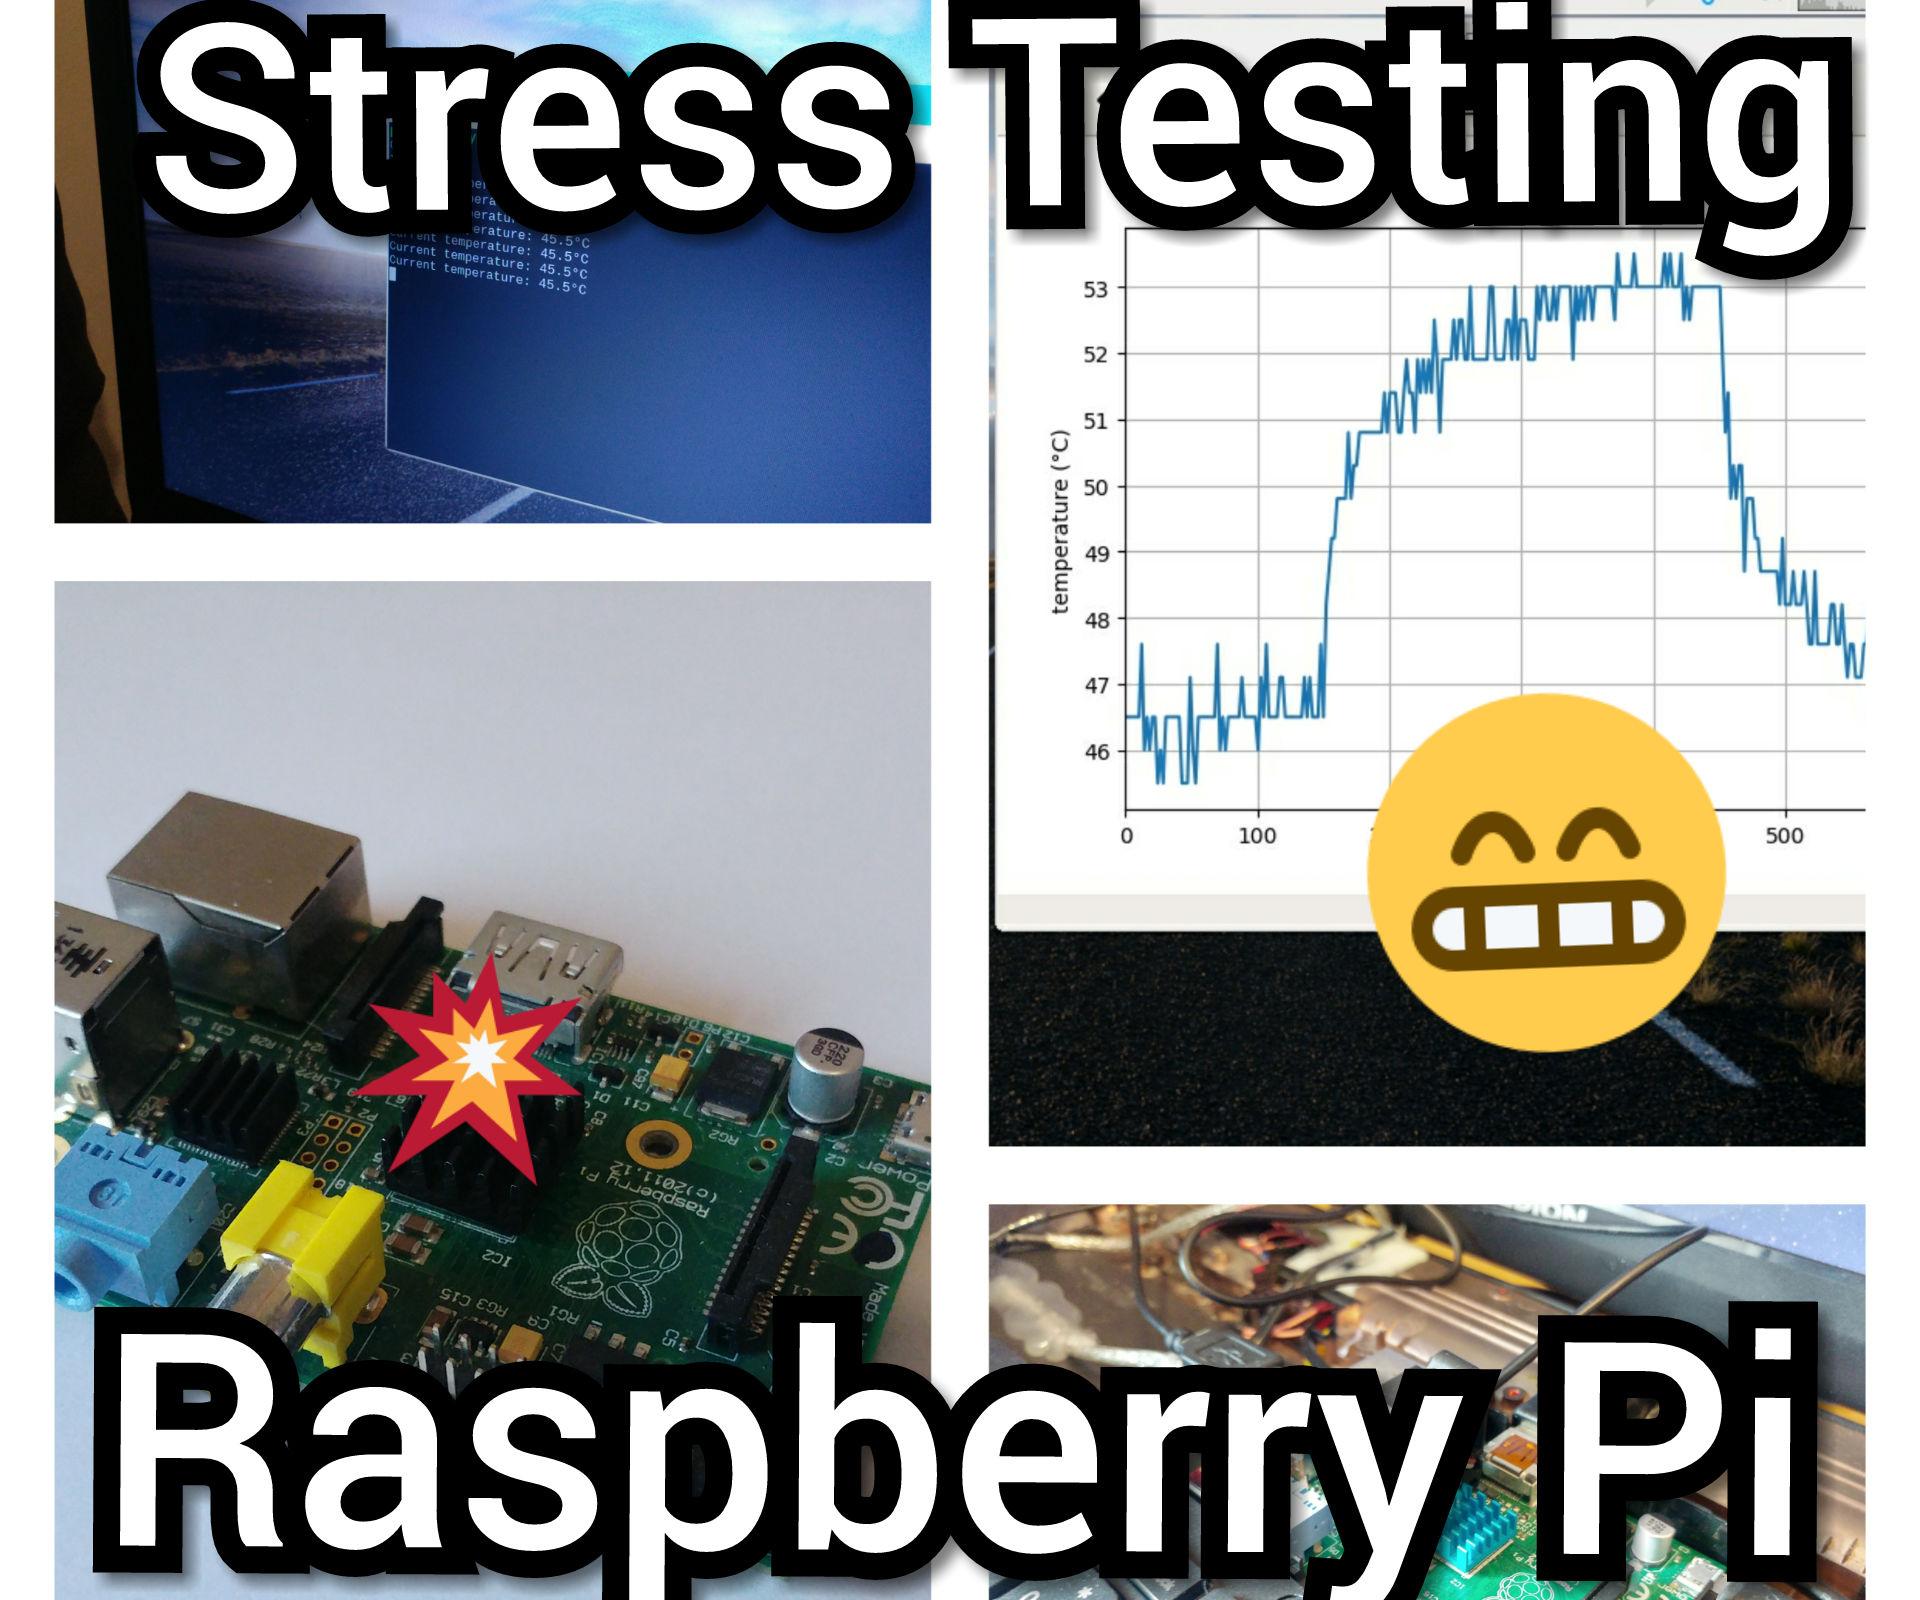 Stress Testing the Raspberry Pi